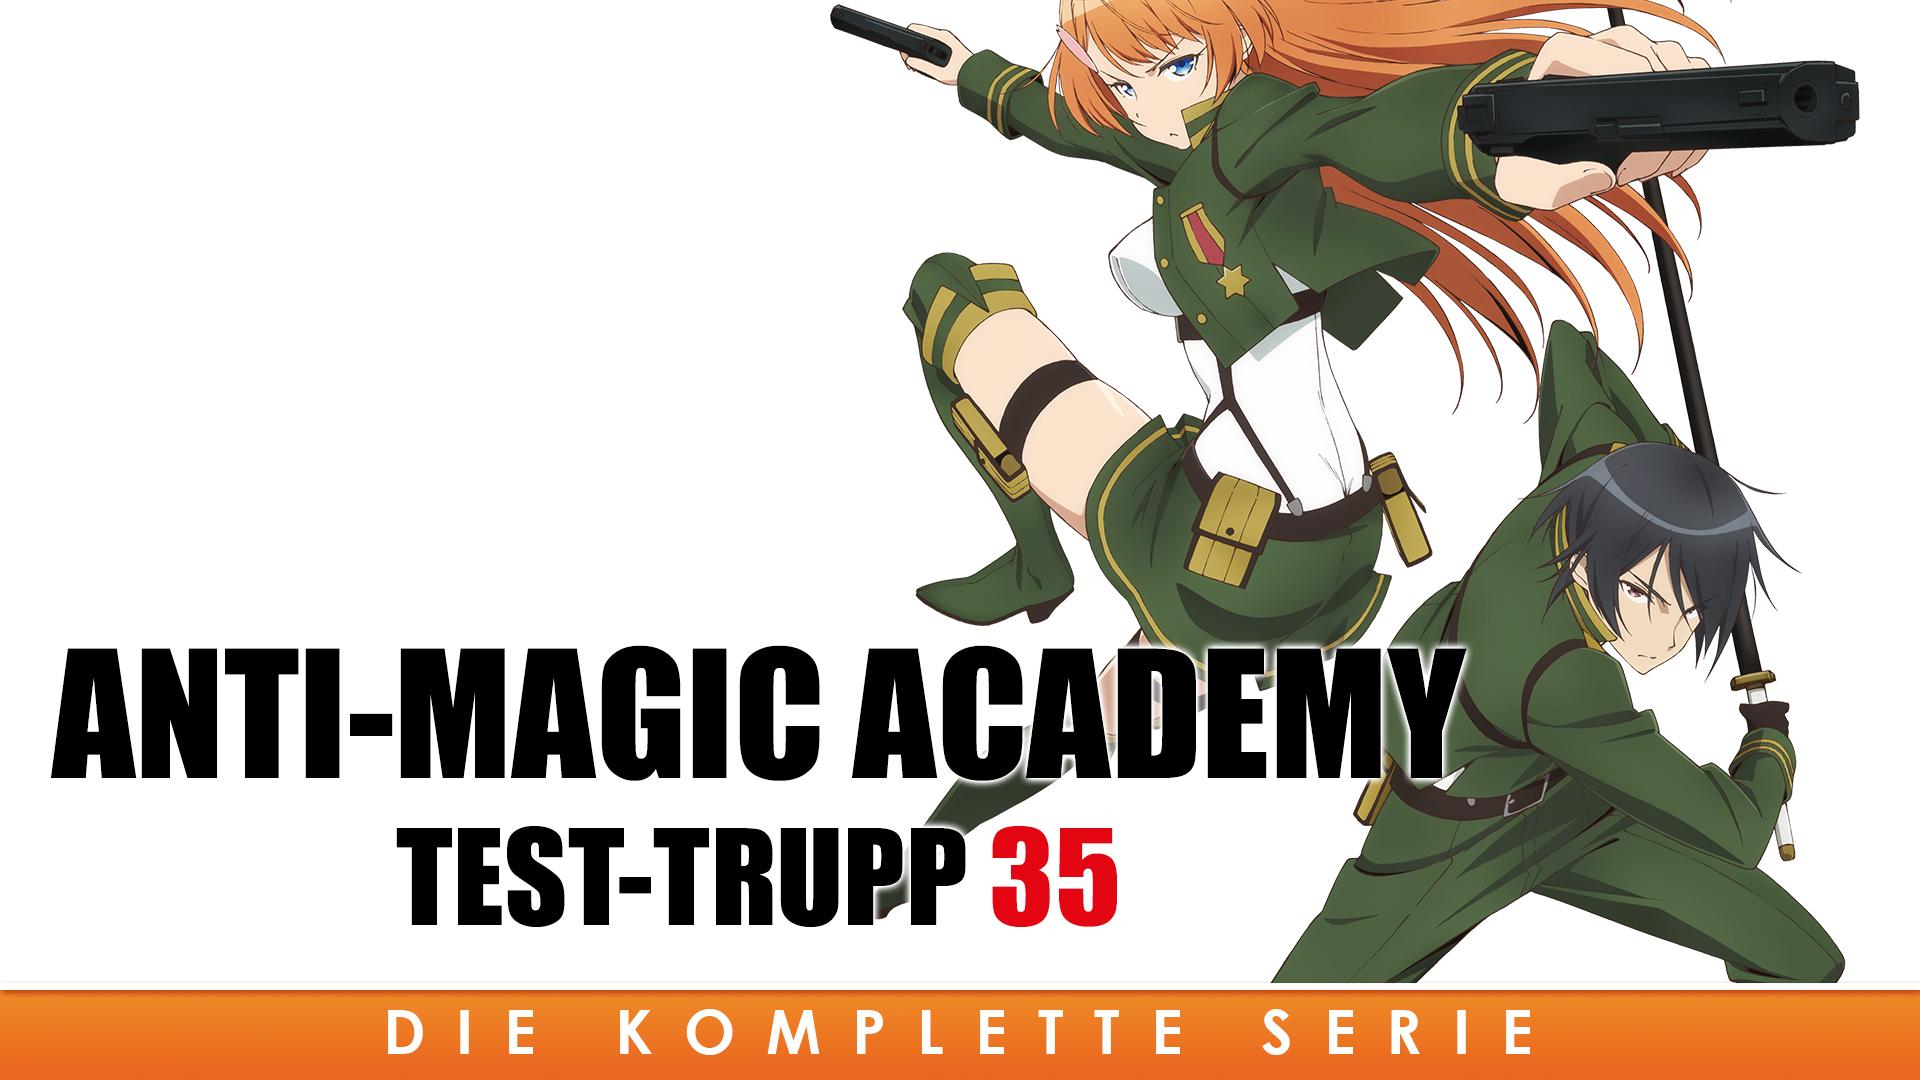 Anti-Magic Academy: Test-Trupp 35